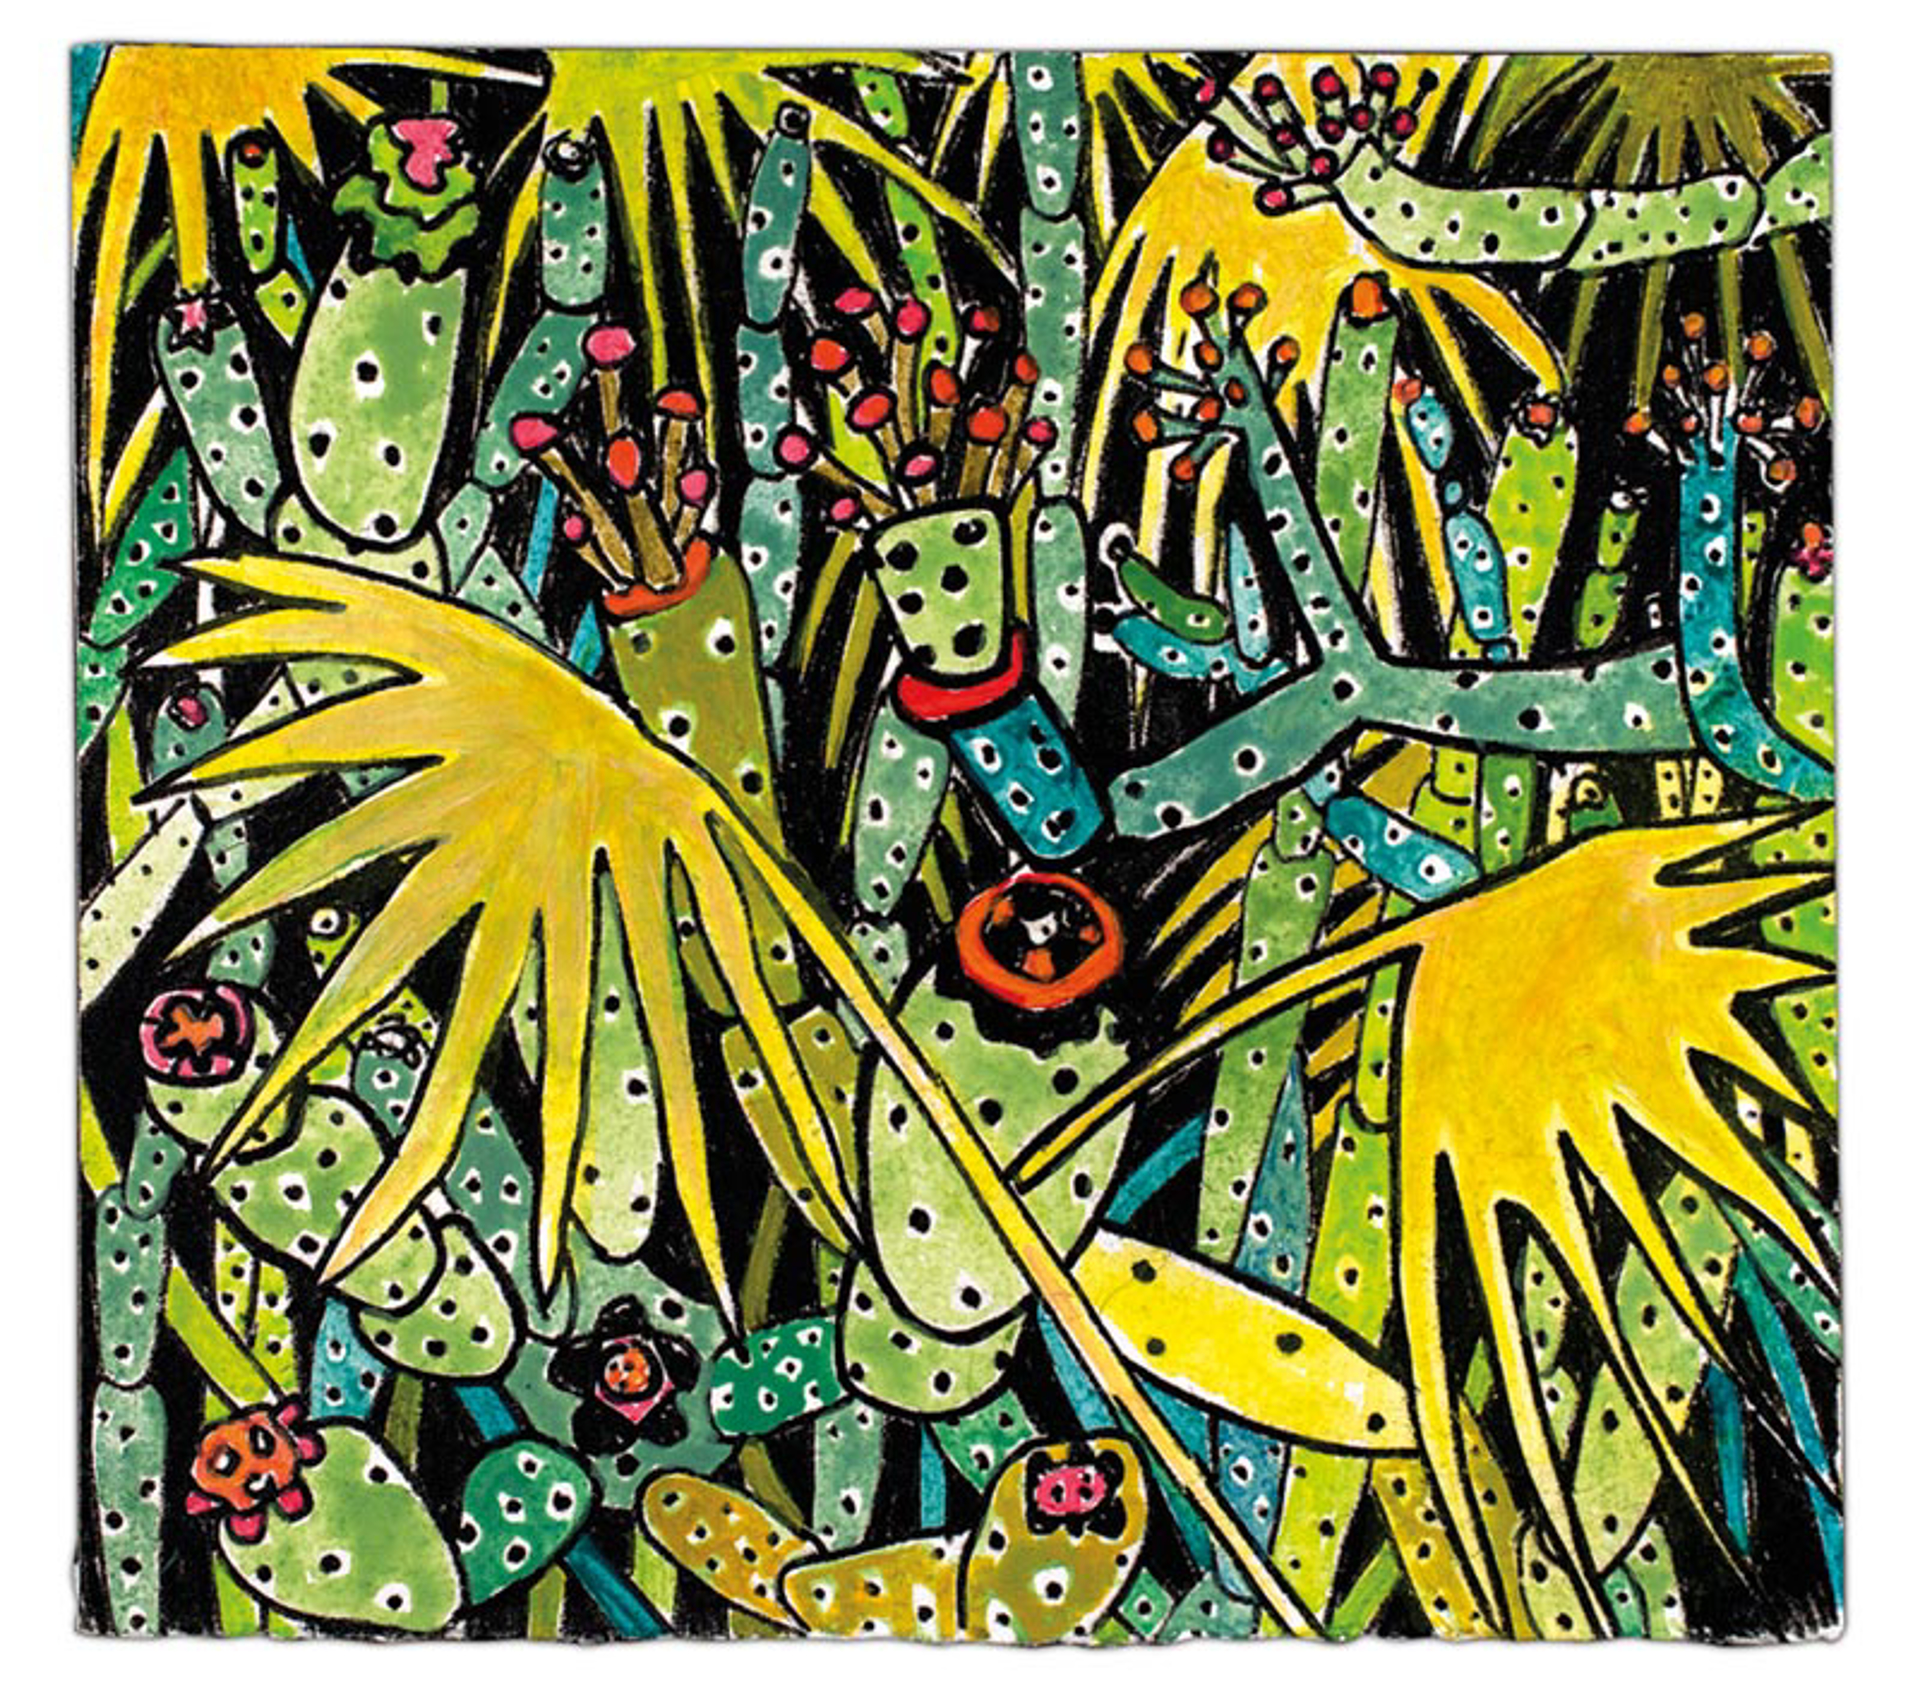 Lotusland 7 by Rebecca Hermann